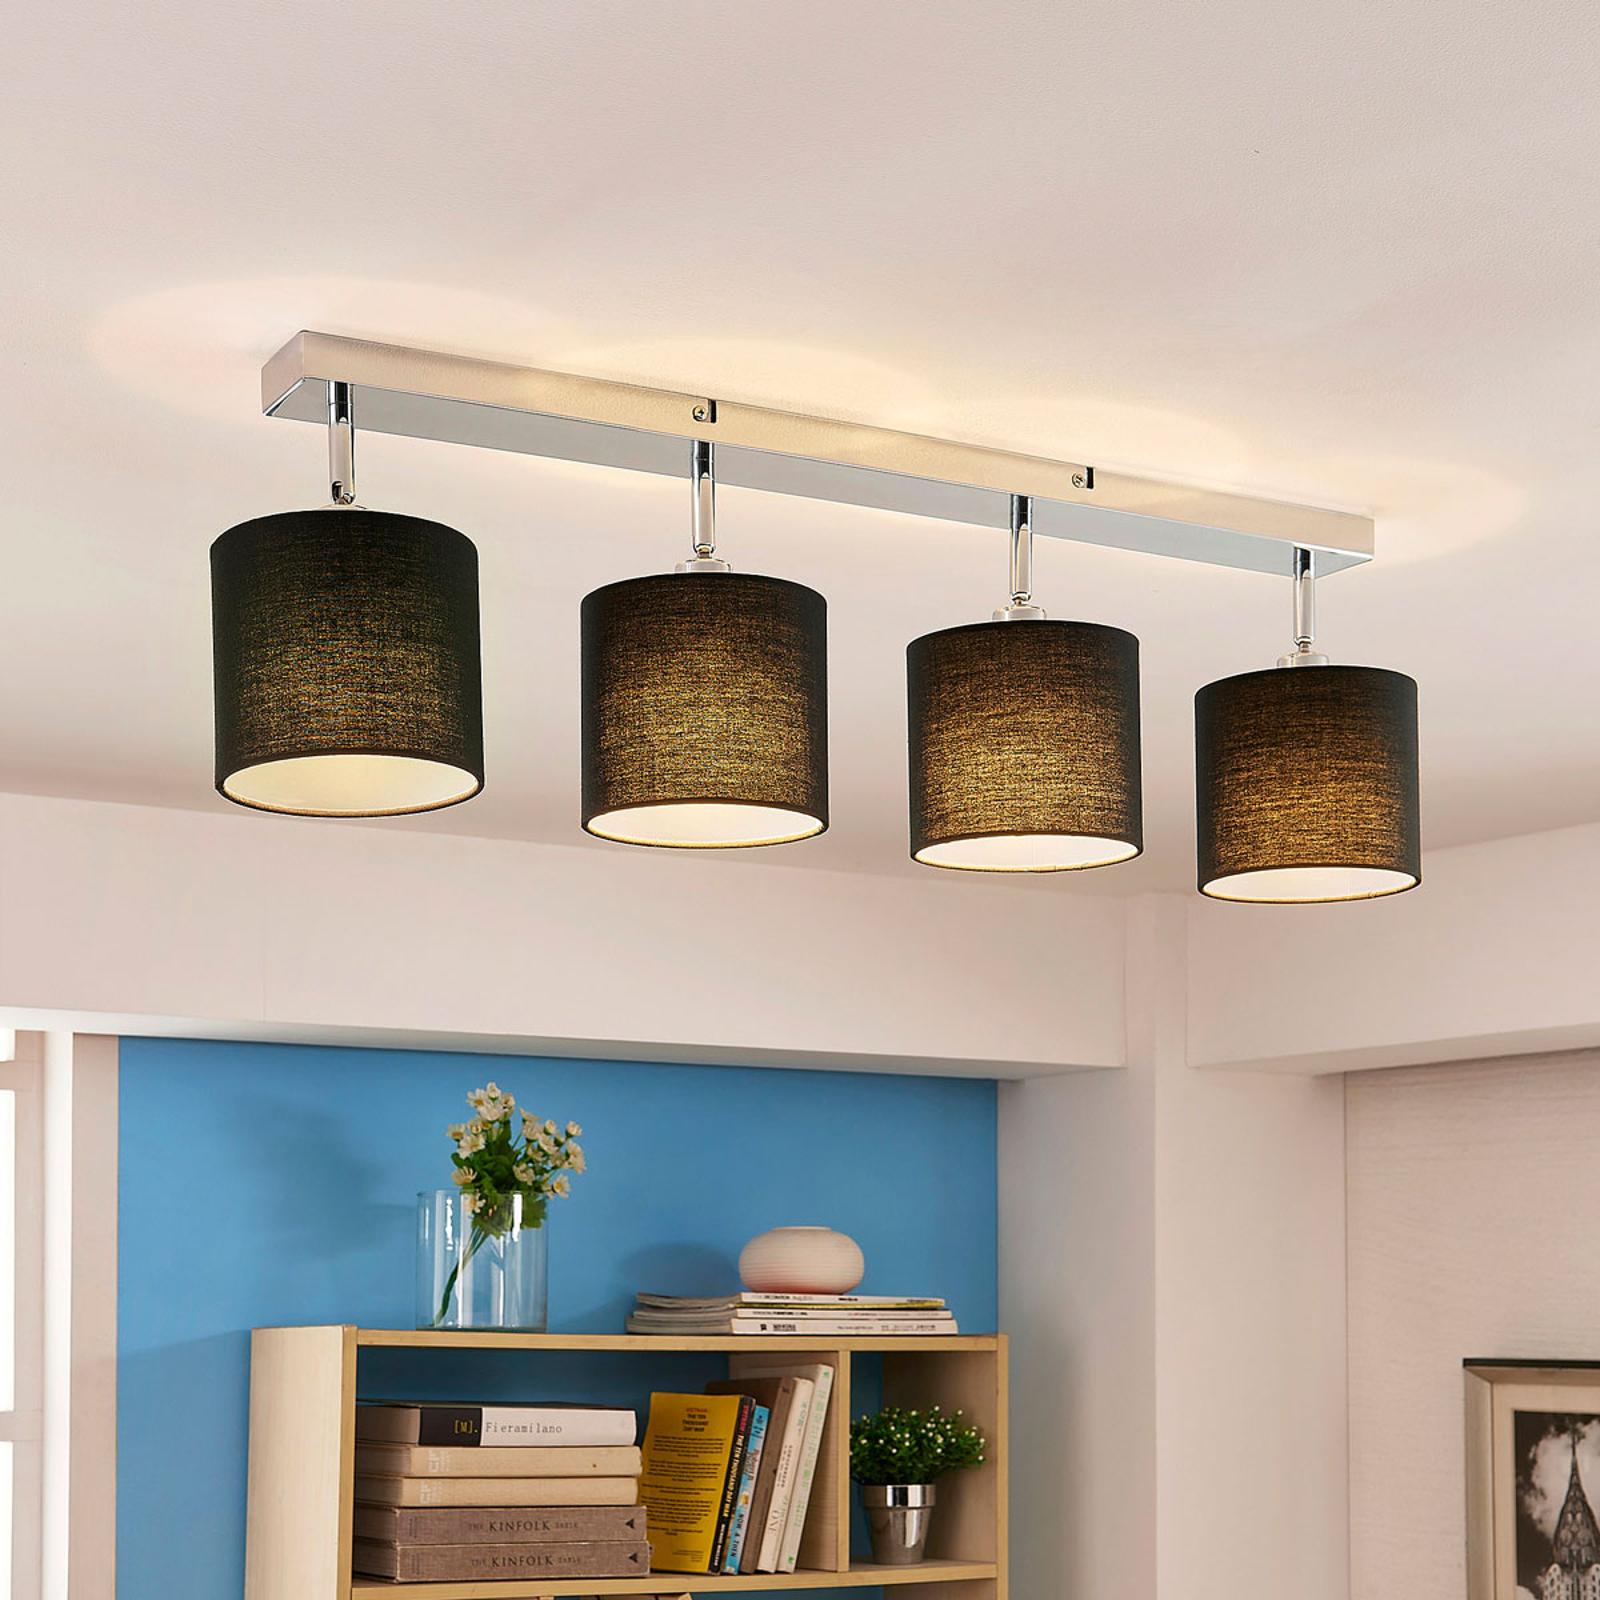 Lampa sufitowa Mairi z czarnymi kloszami i LED